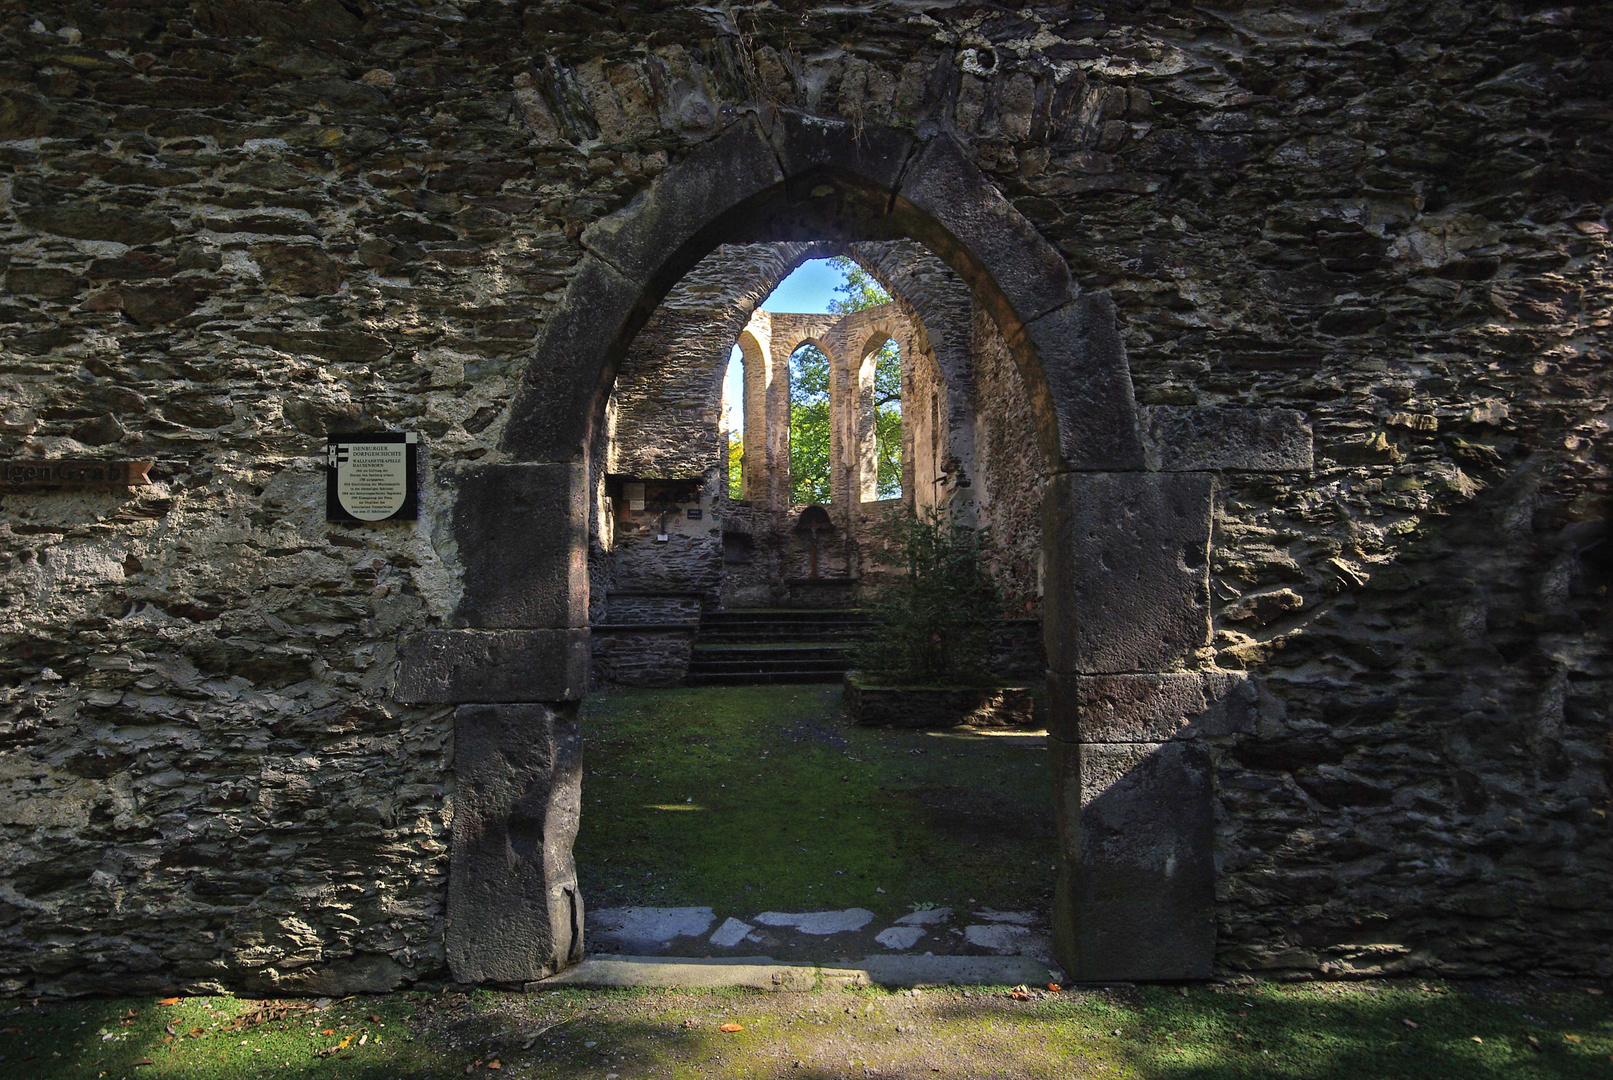 Kirchenruine Hausenborn bei Isenburg / Saynbachtal / Westerwald